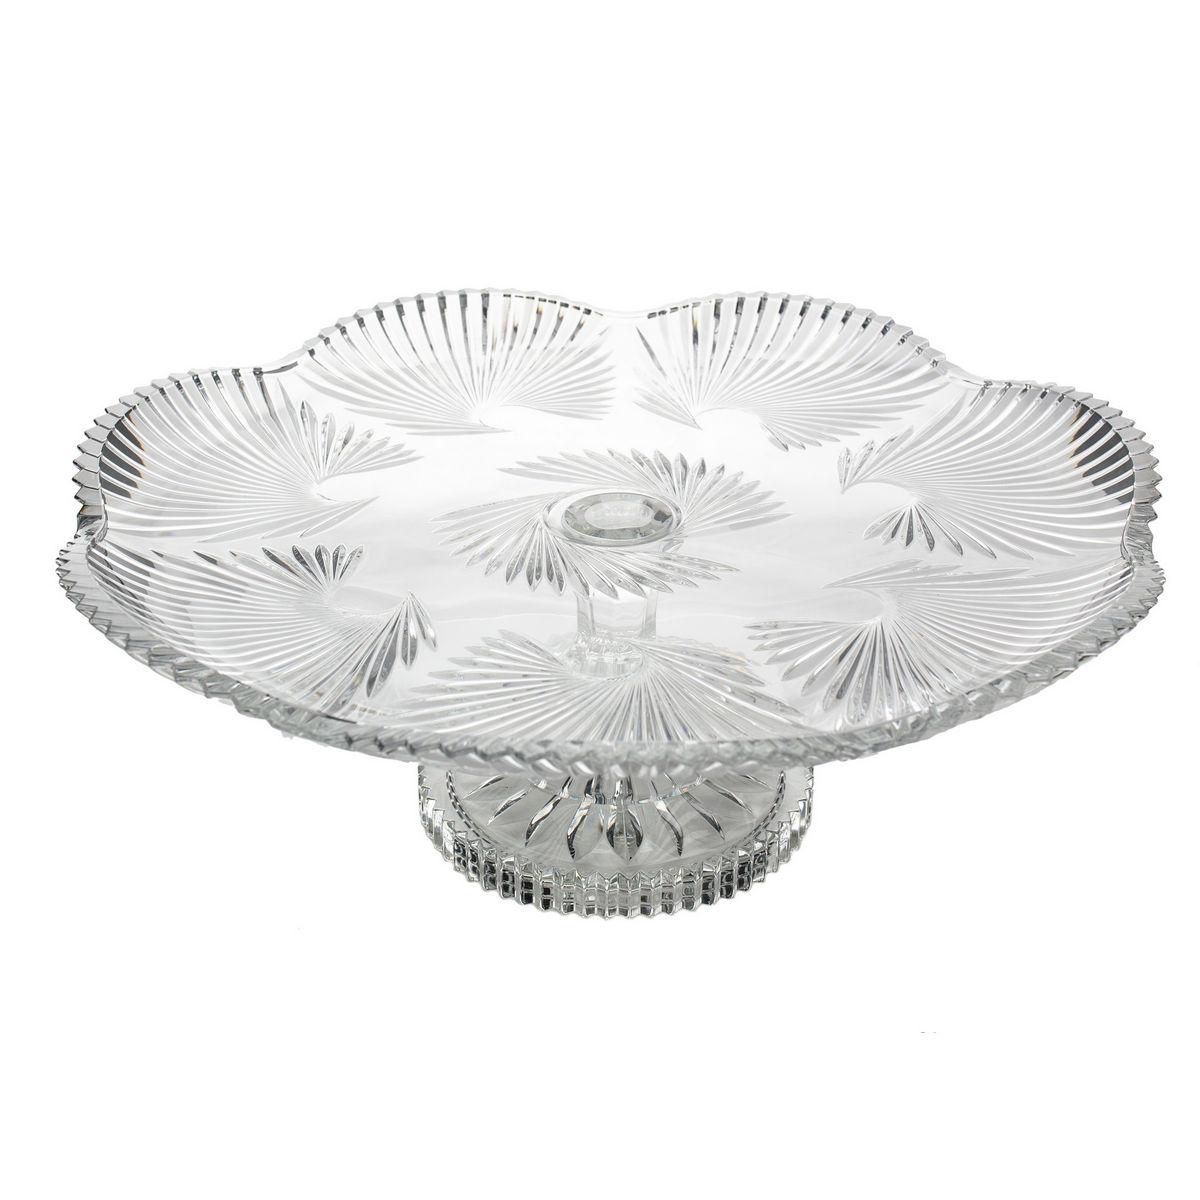 Platou Cristal Bohemia Cu Picior 40 Cm 2021 aranjareamesei.ro